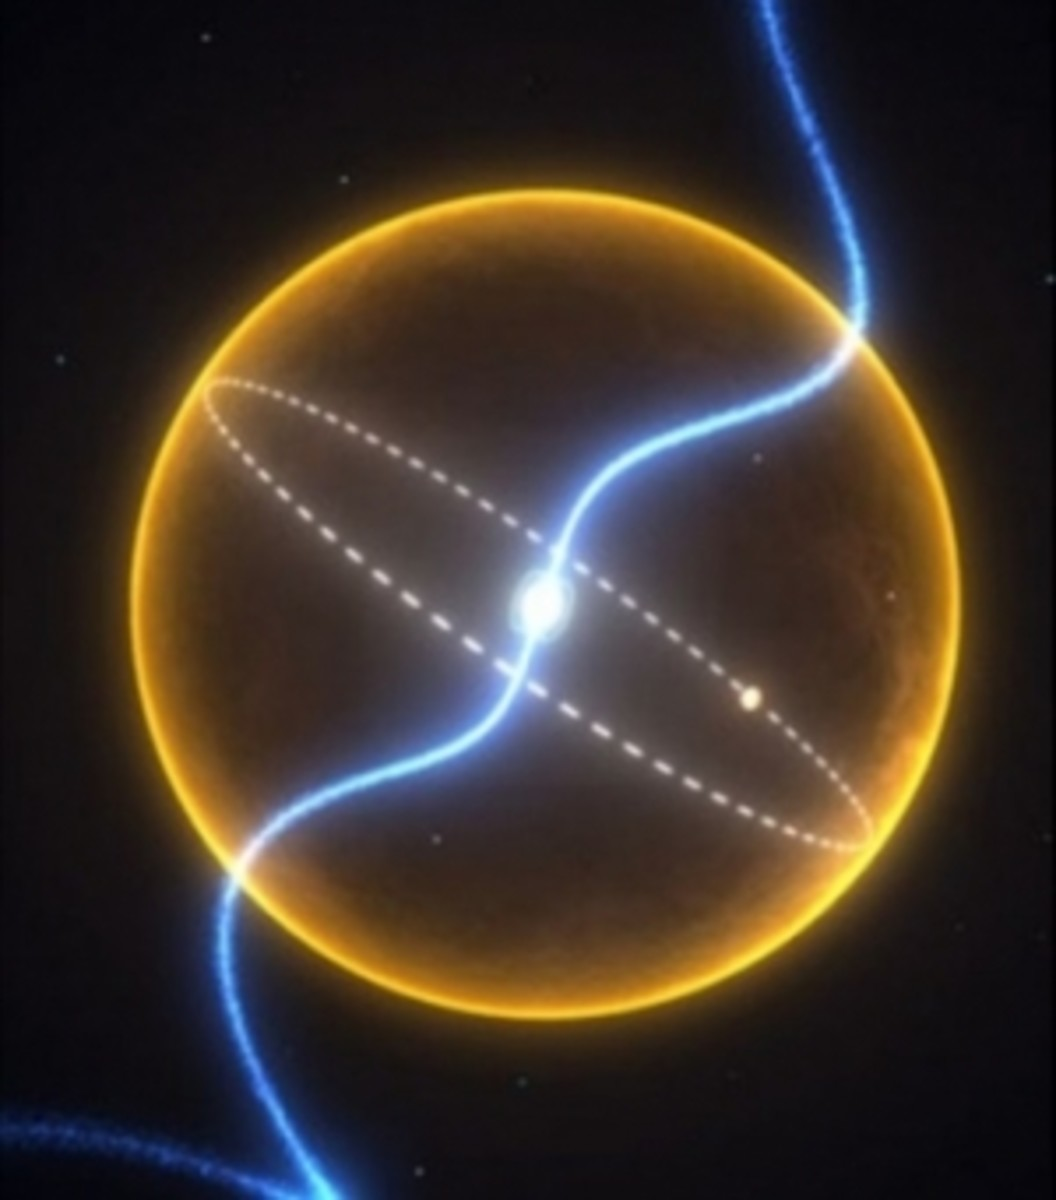 Planet PSR J 1719-1438b, orbiting the millisecond-pulsar PSR J 1719-1438b.